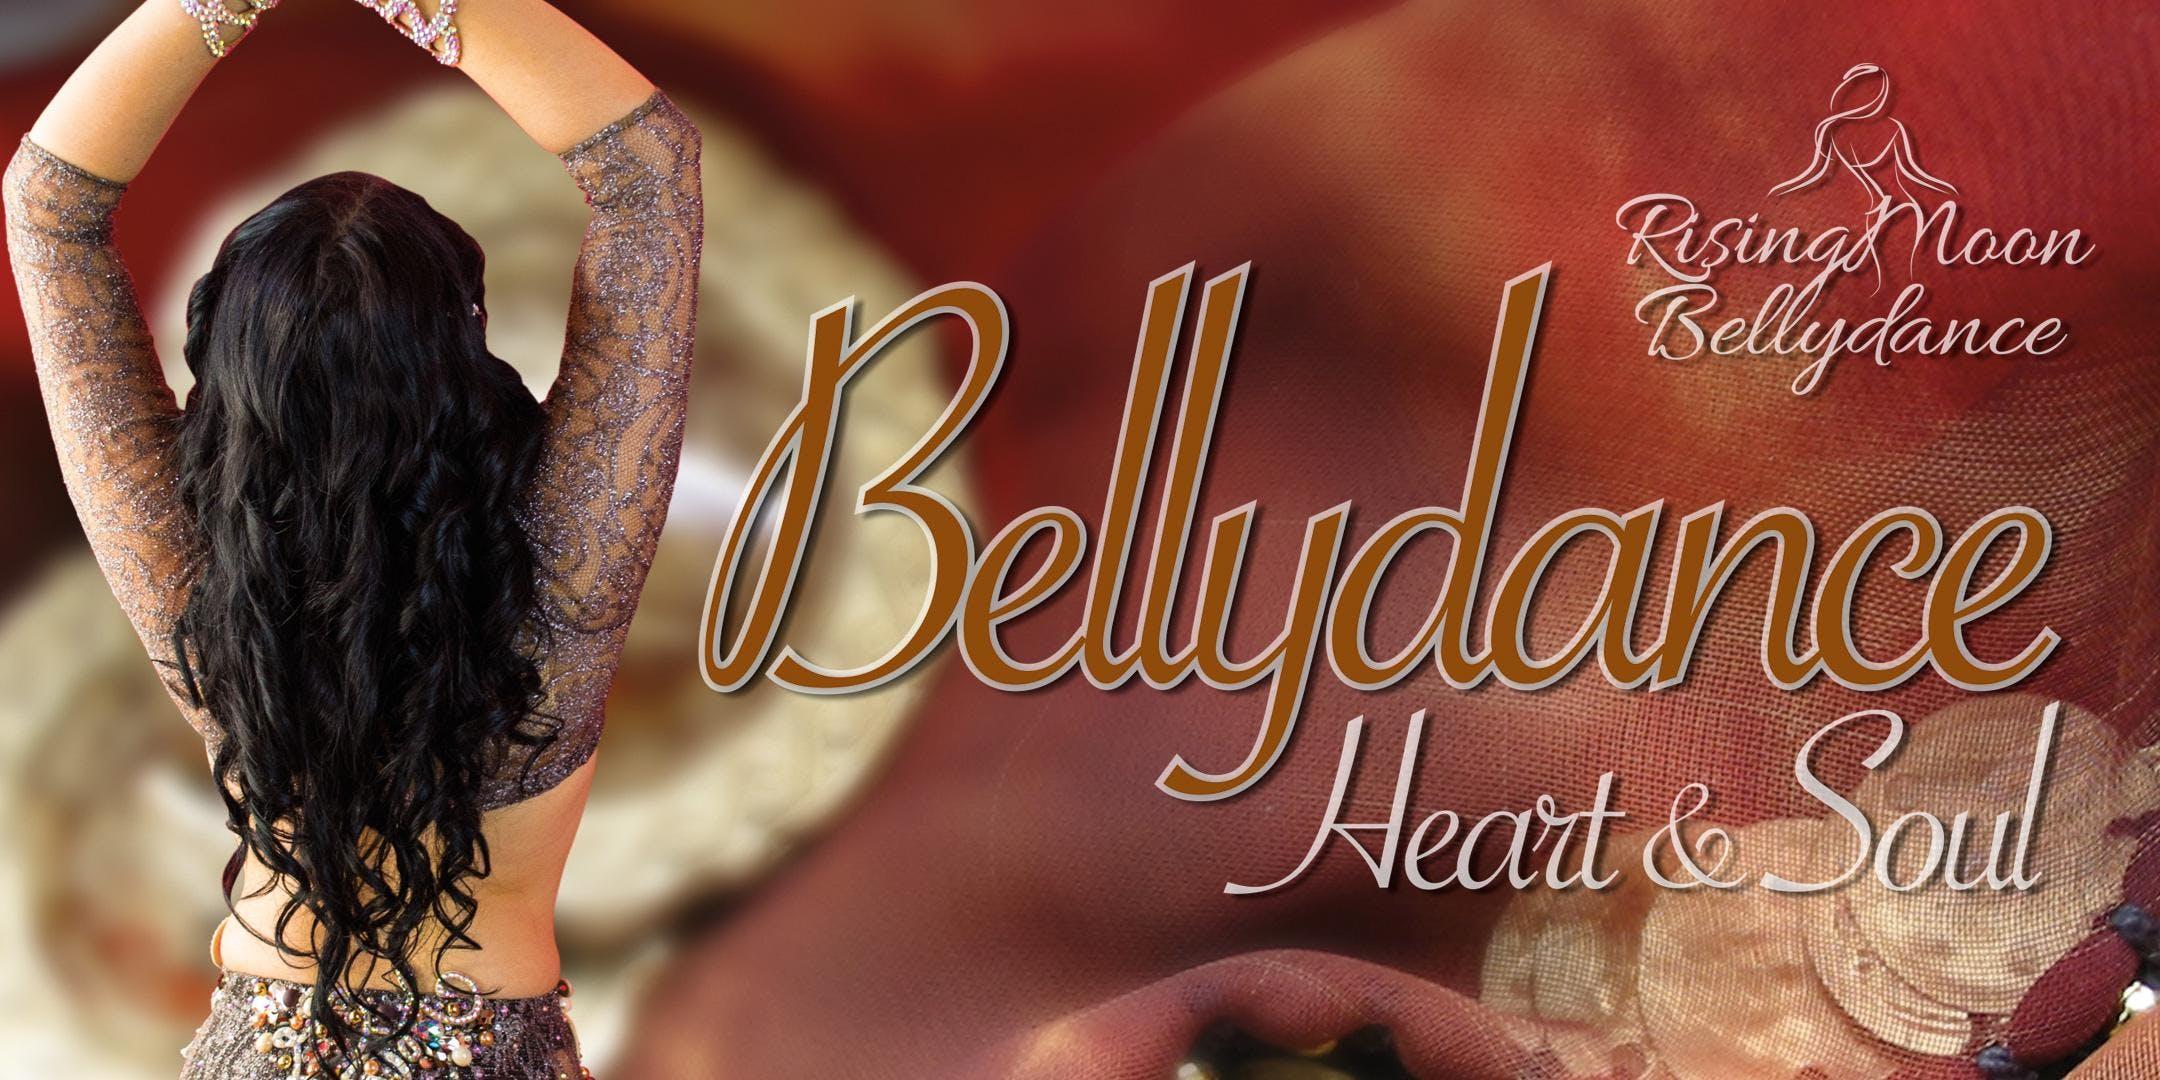 Bellydance Heart & Soul